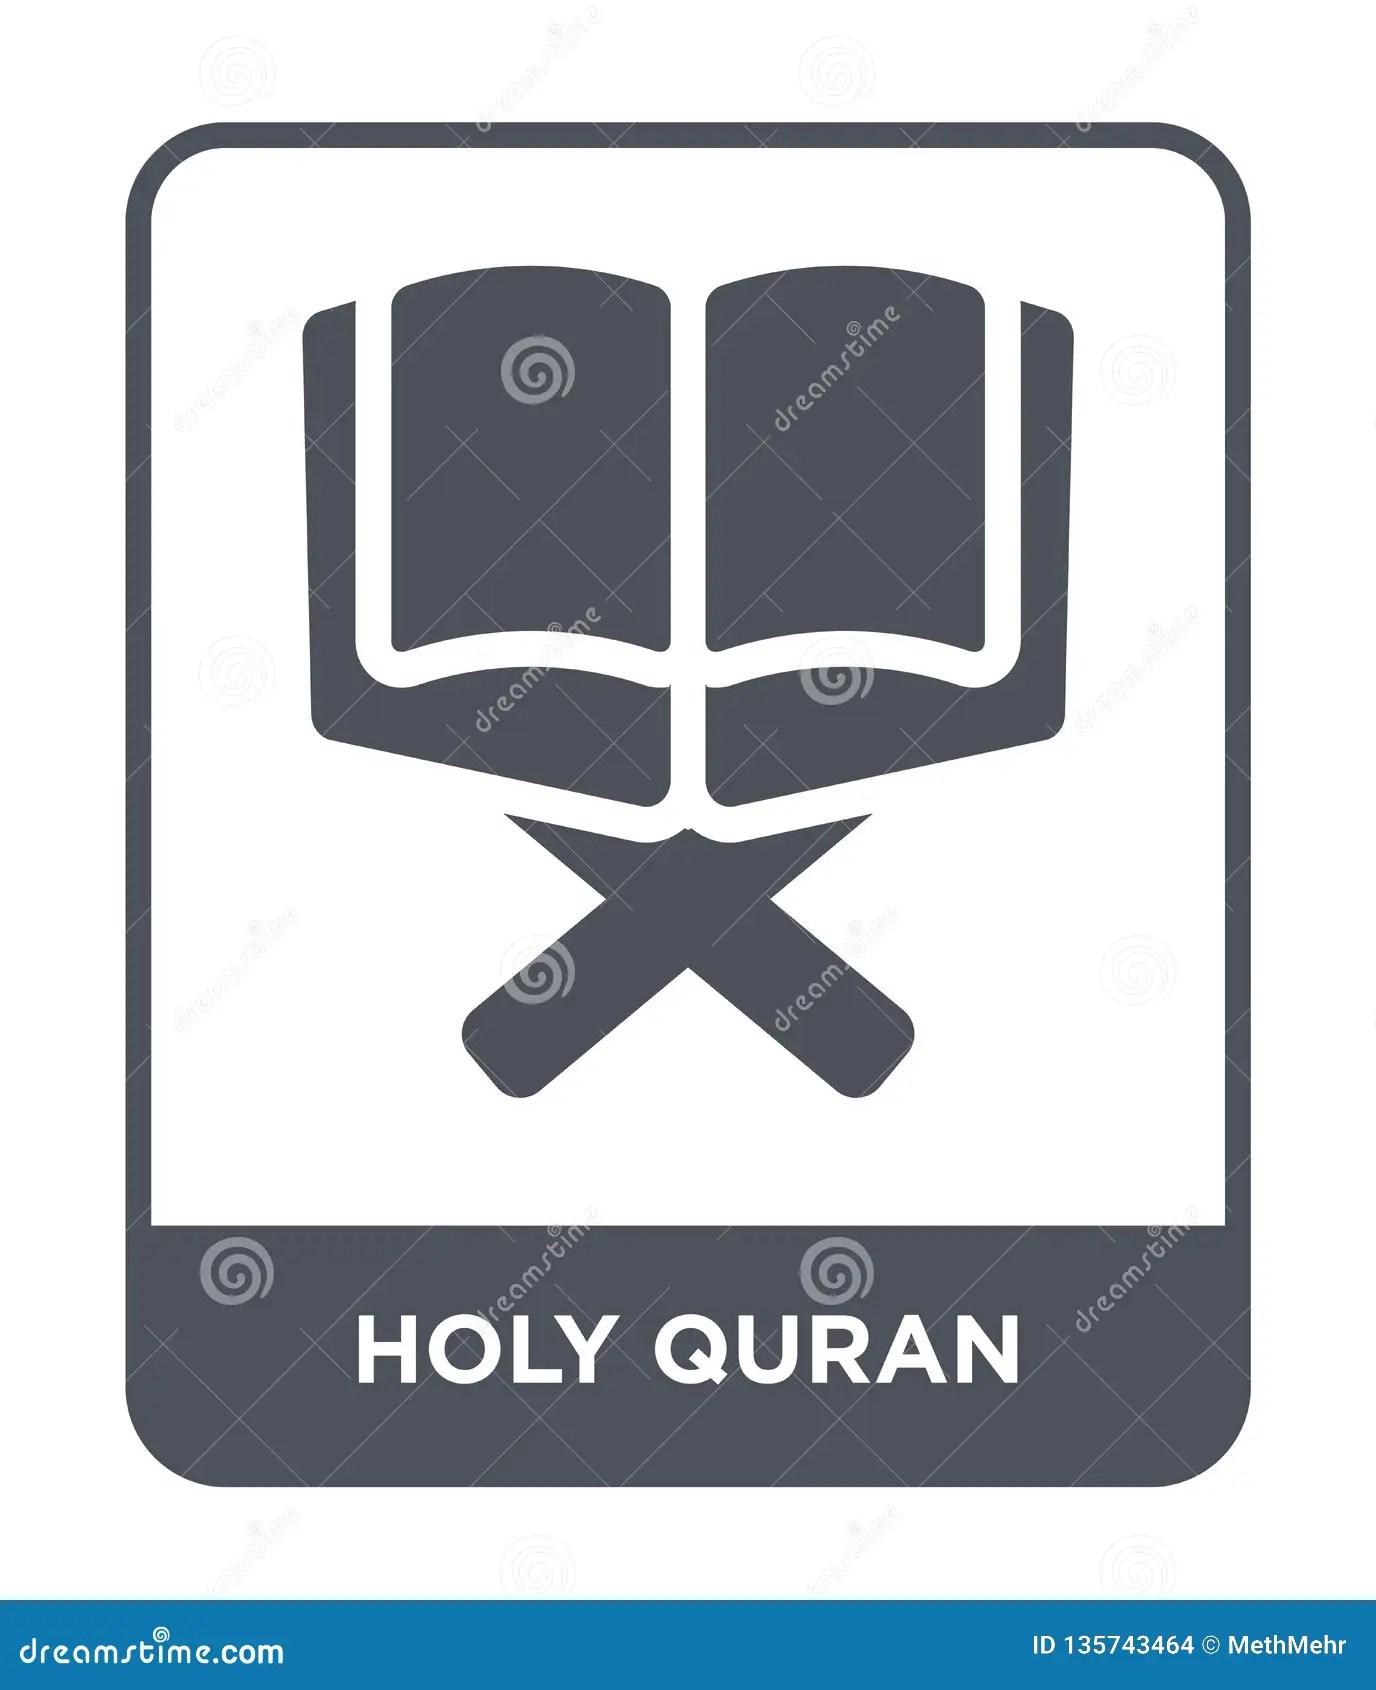 Logo Quran Vector : quran, vector, Quran, Trendy, Design, Style., Isolated, White, Background., Vector, Simple, Modern, Stock, Illustration, Design,, Moon:, 135743464